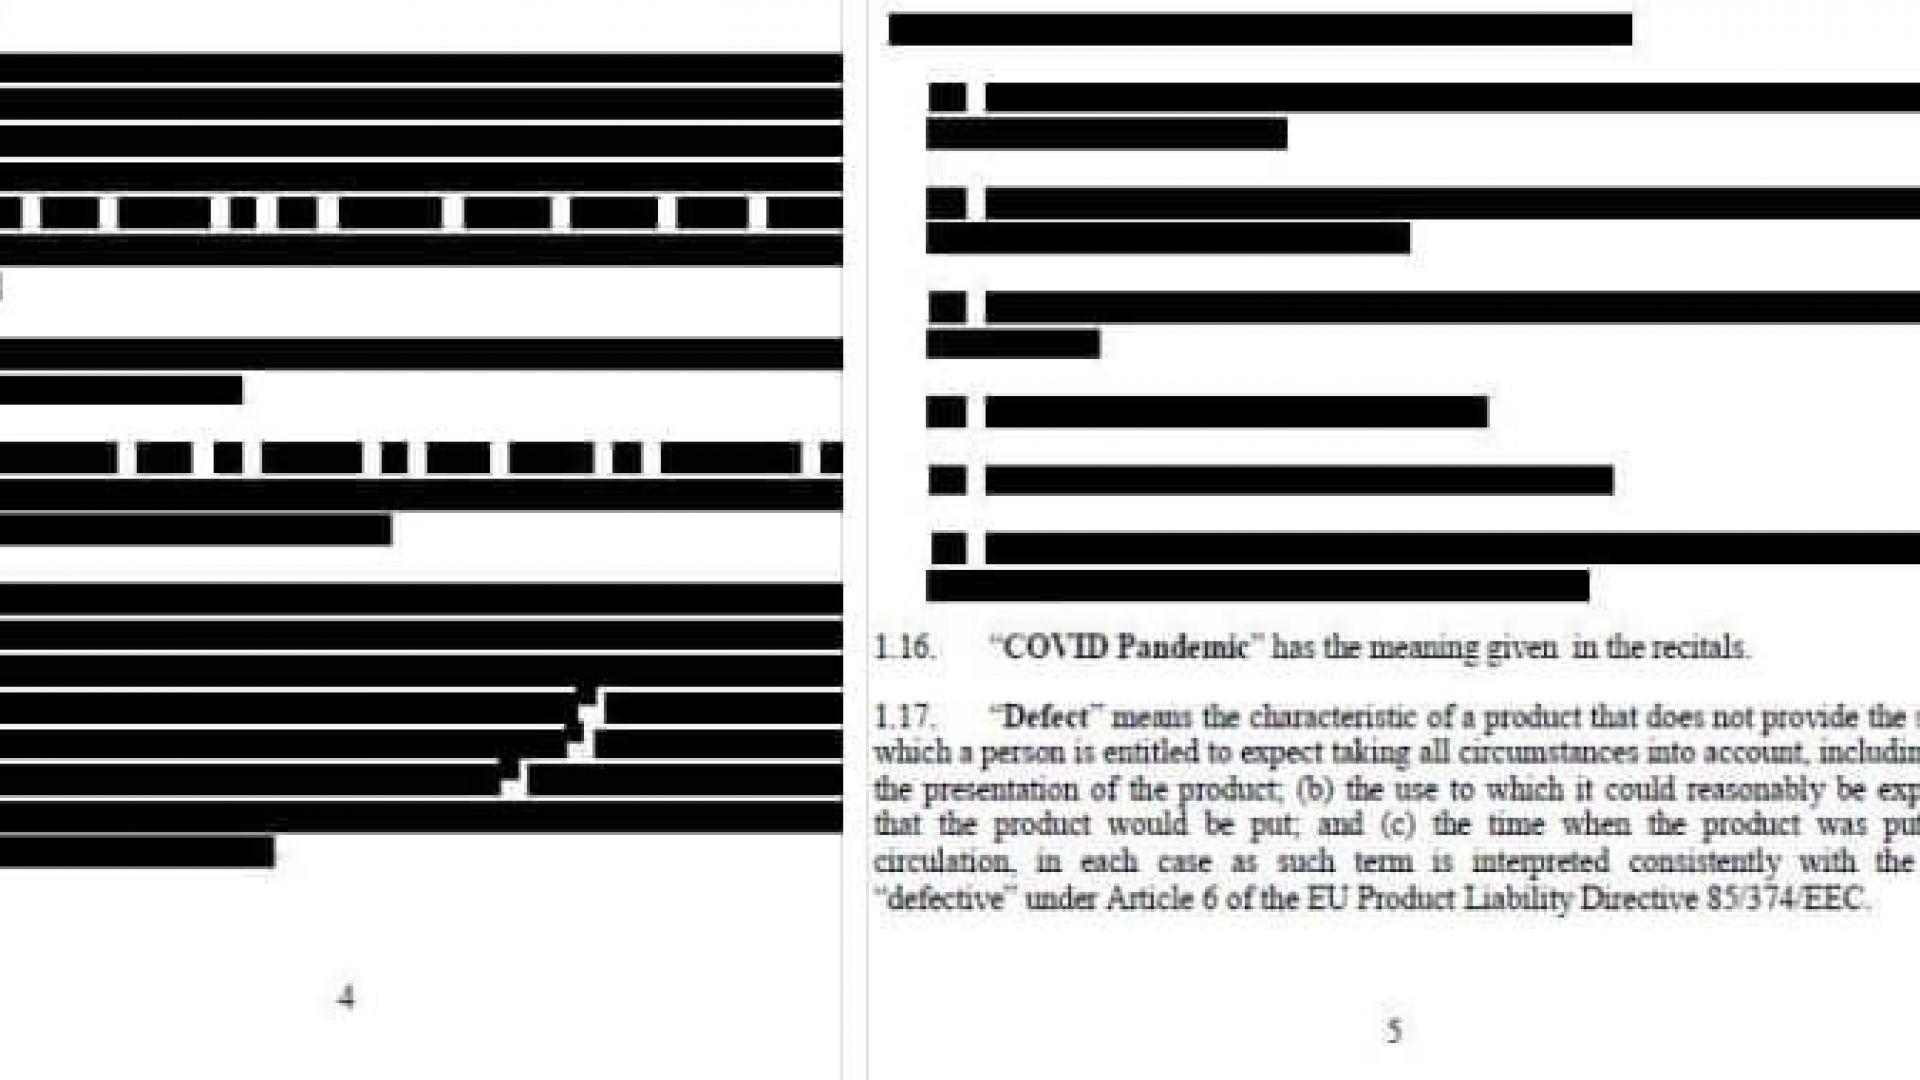 ЕК публикува цензуриран договор с АстраЗенека